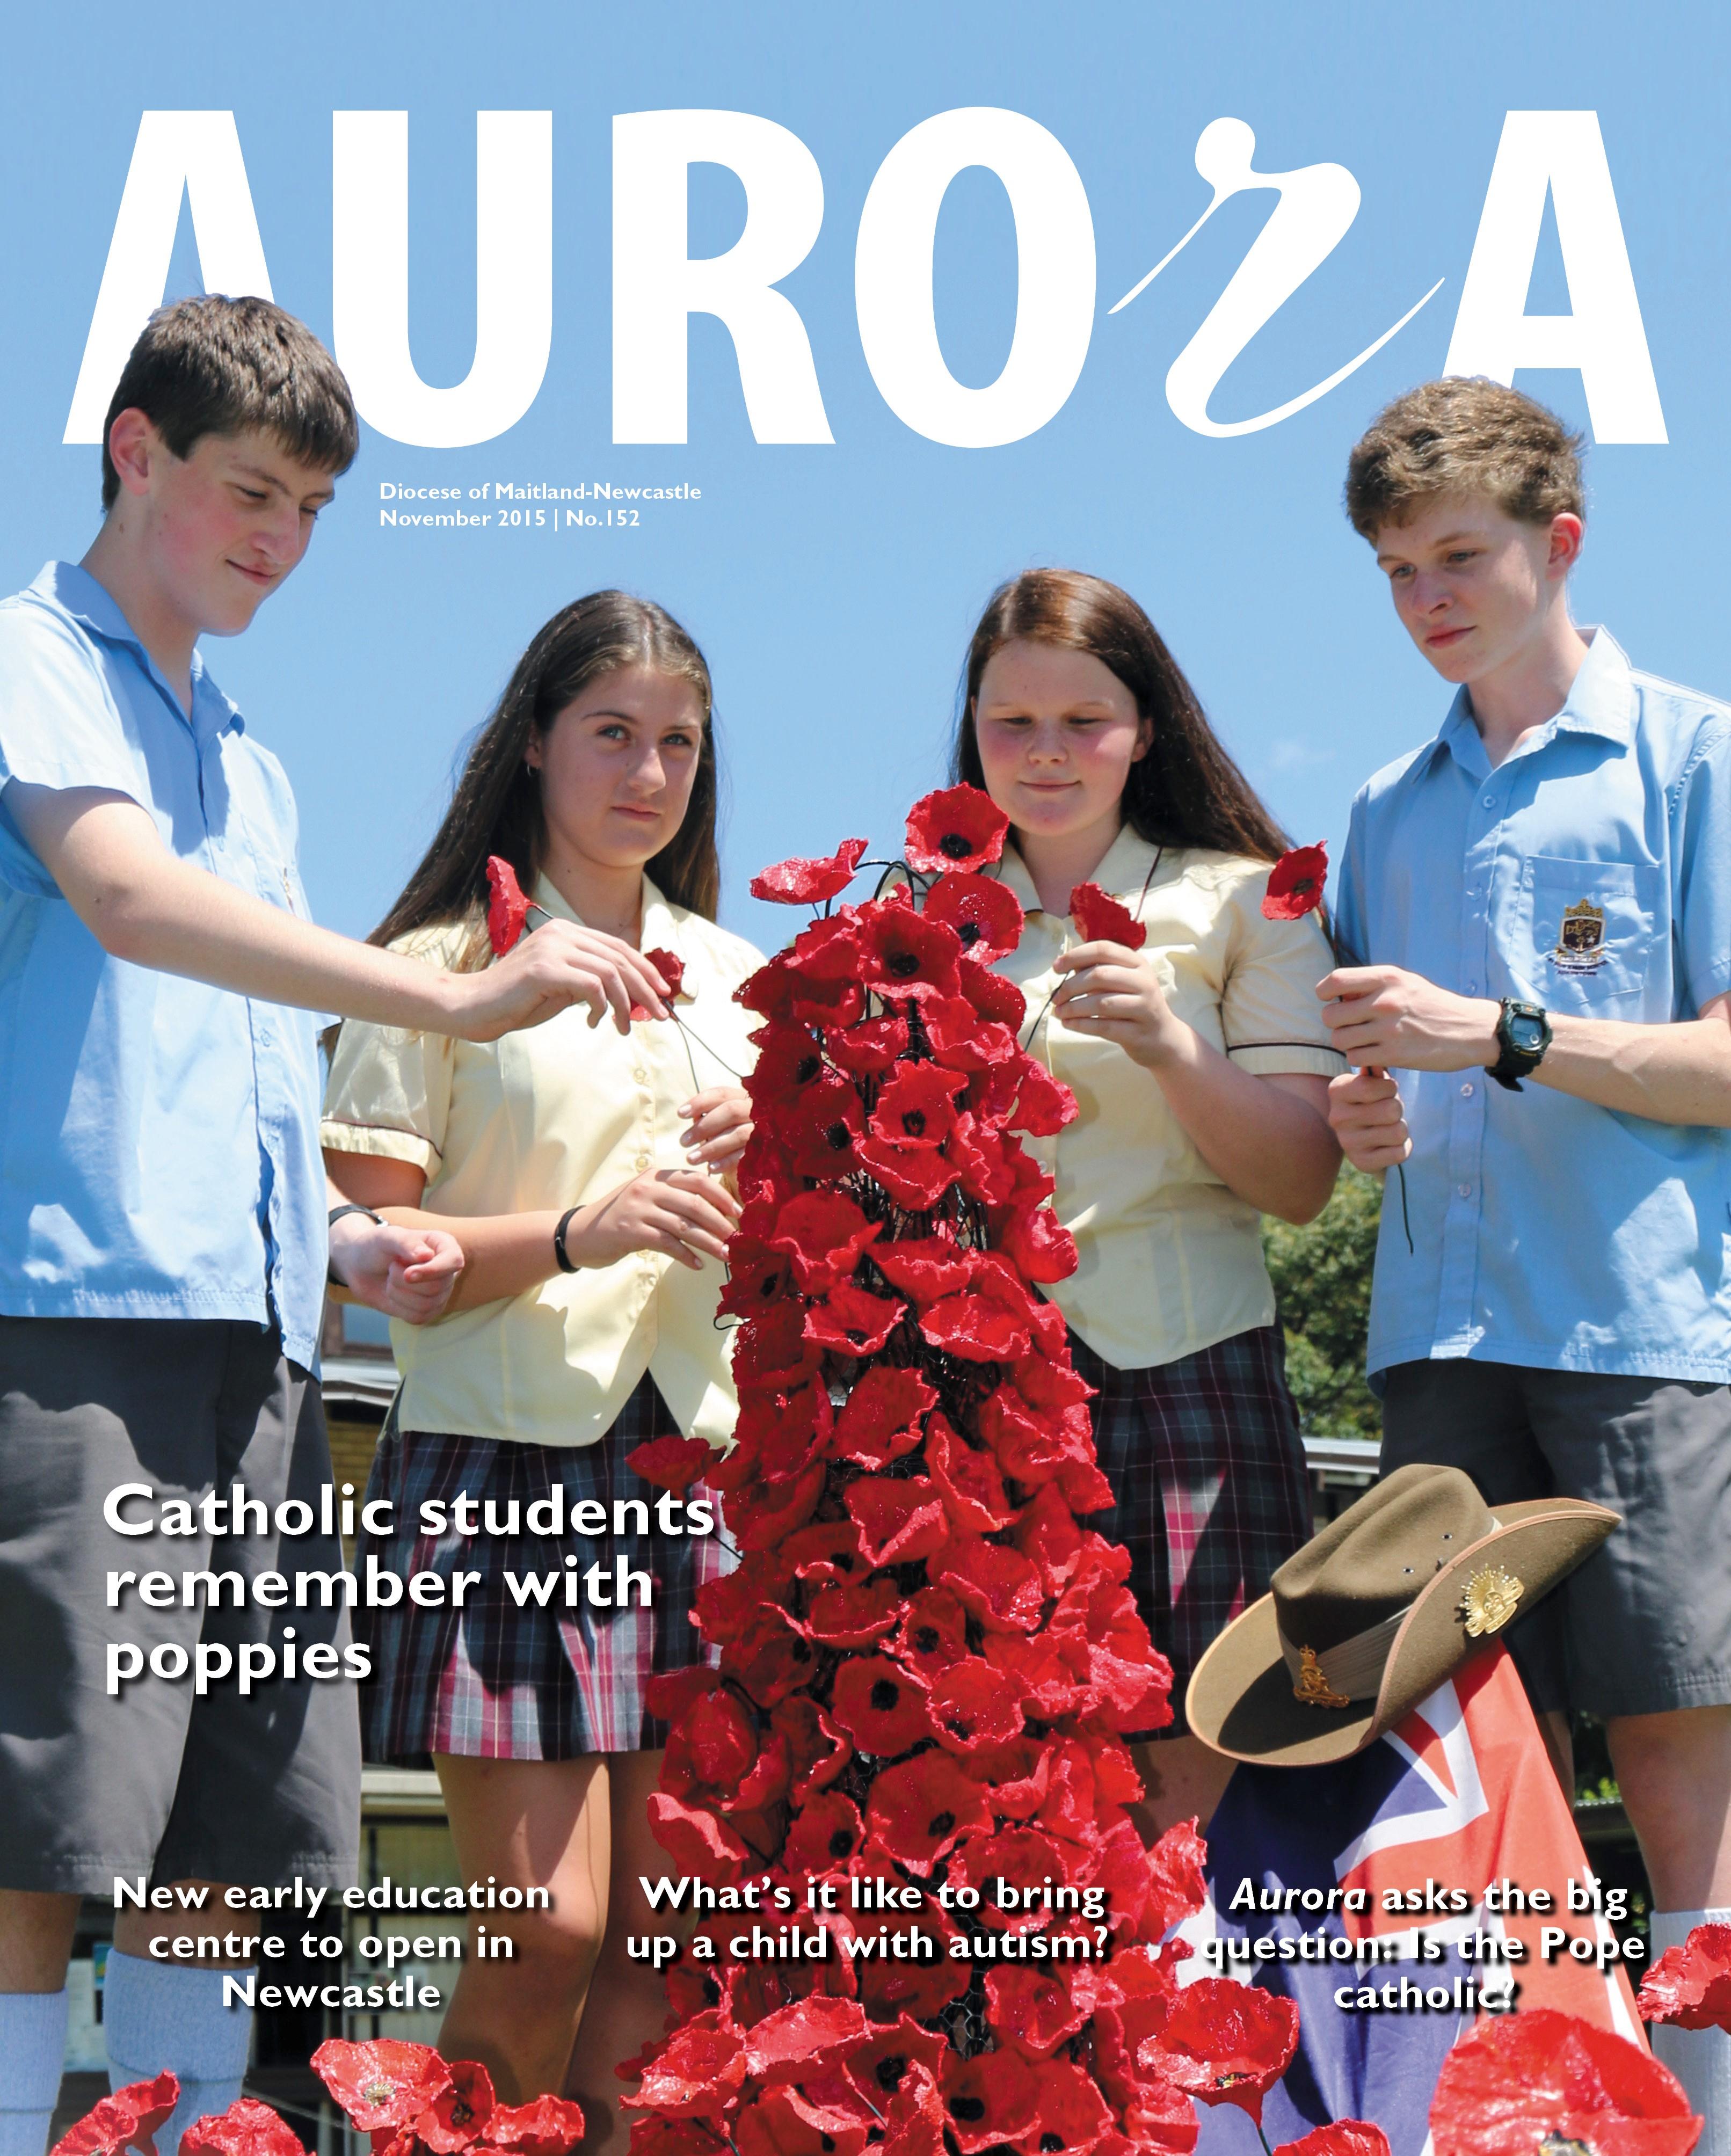 Aurora November 2015 Cover Image